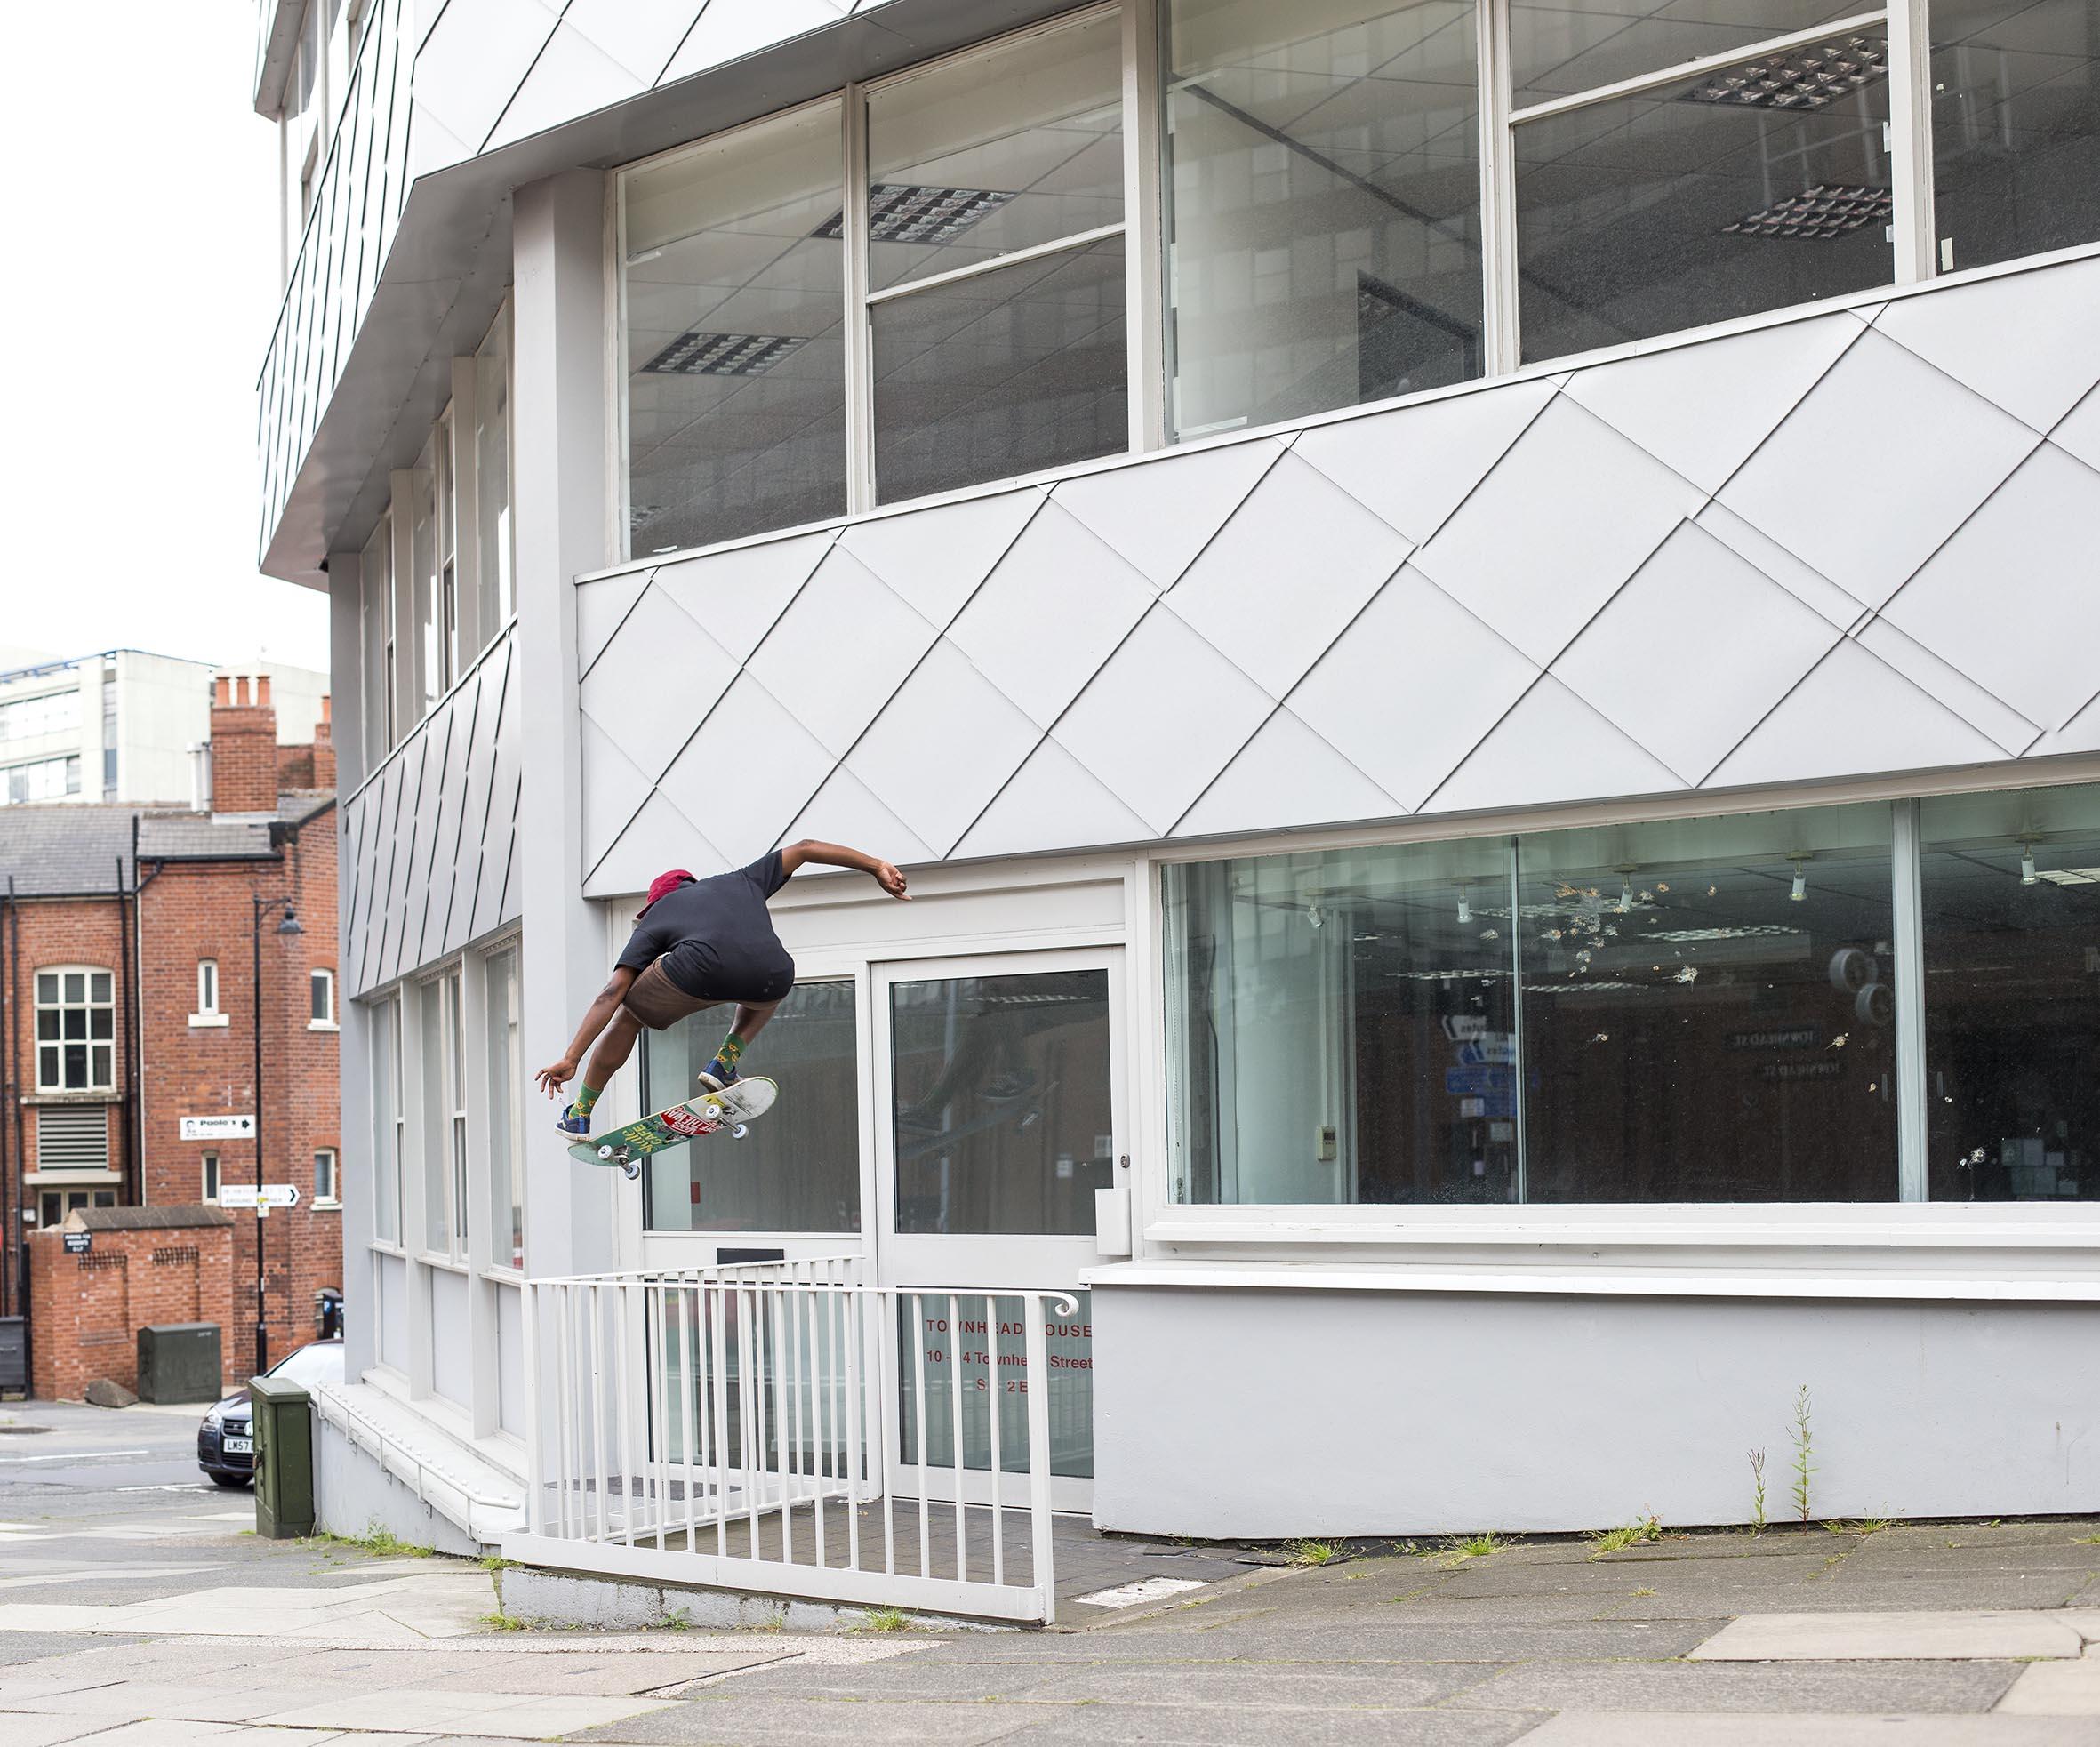 Shaun Currie - kickflip from windowsill